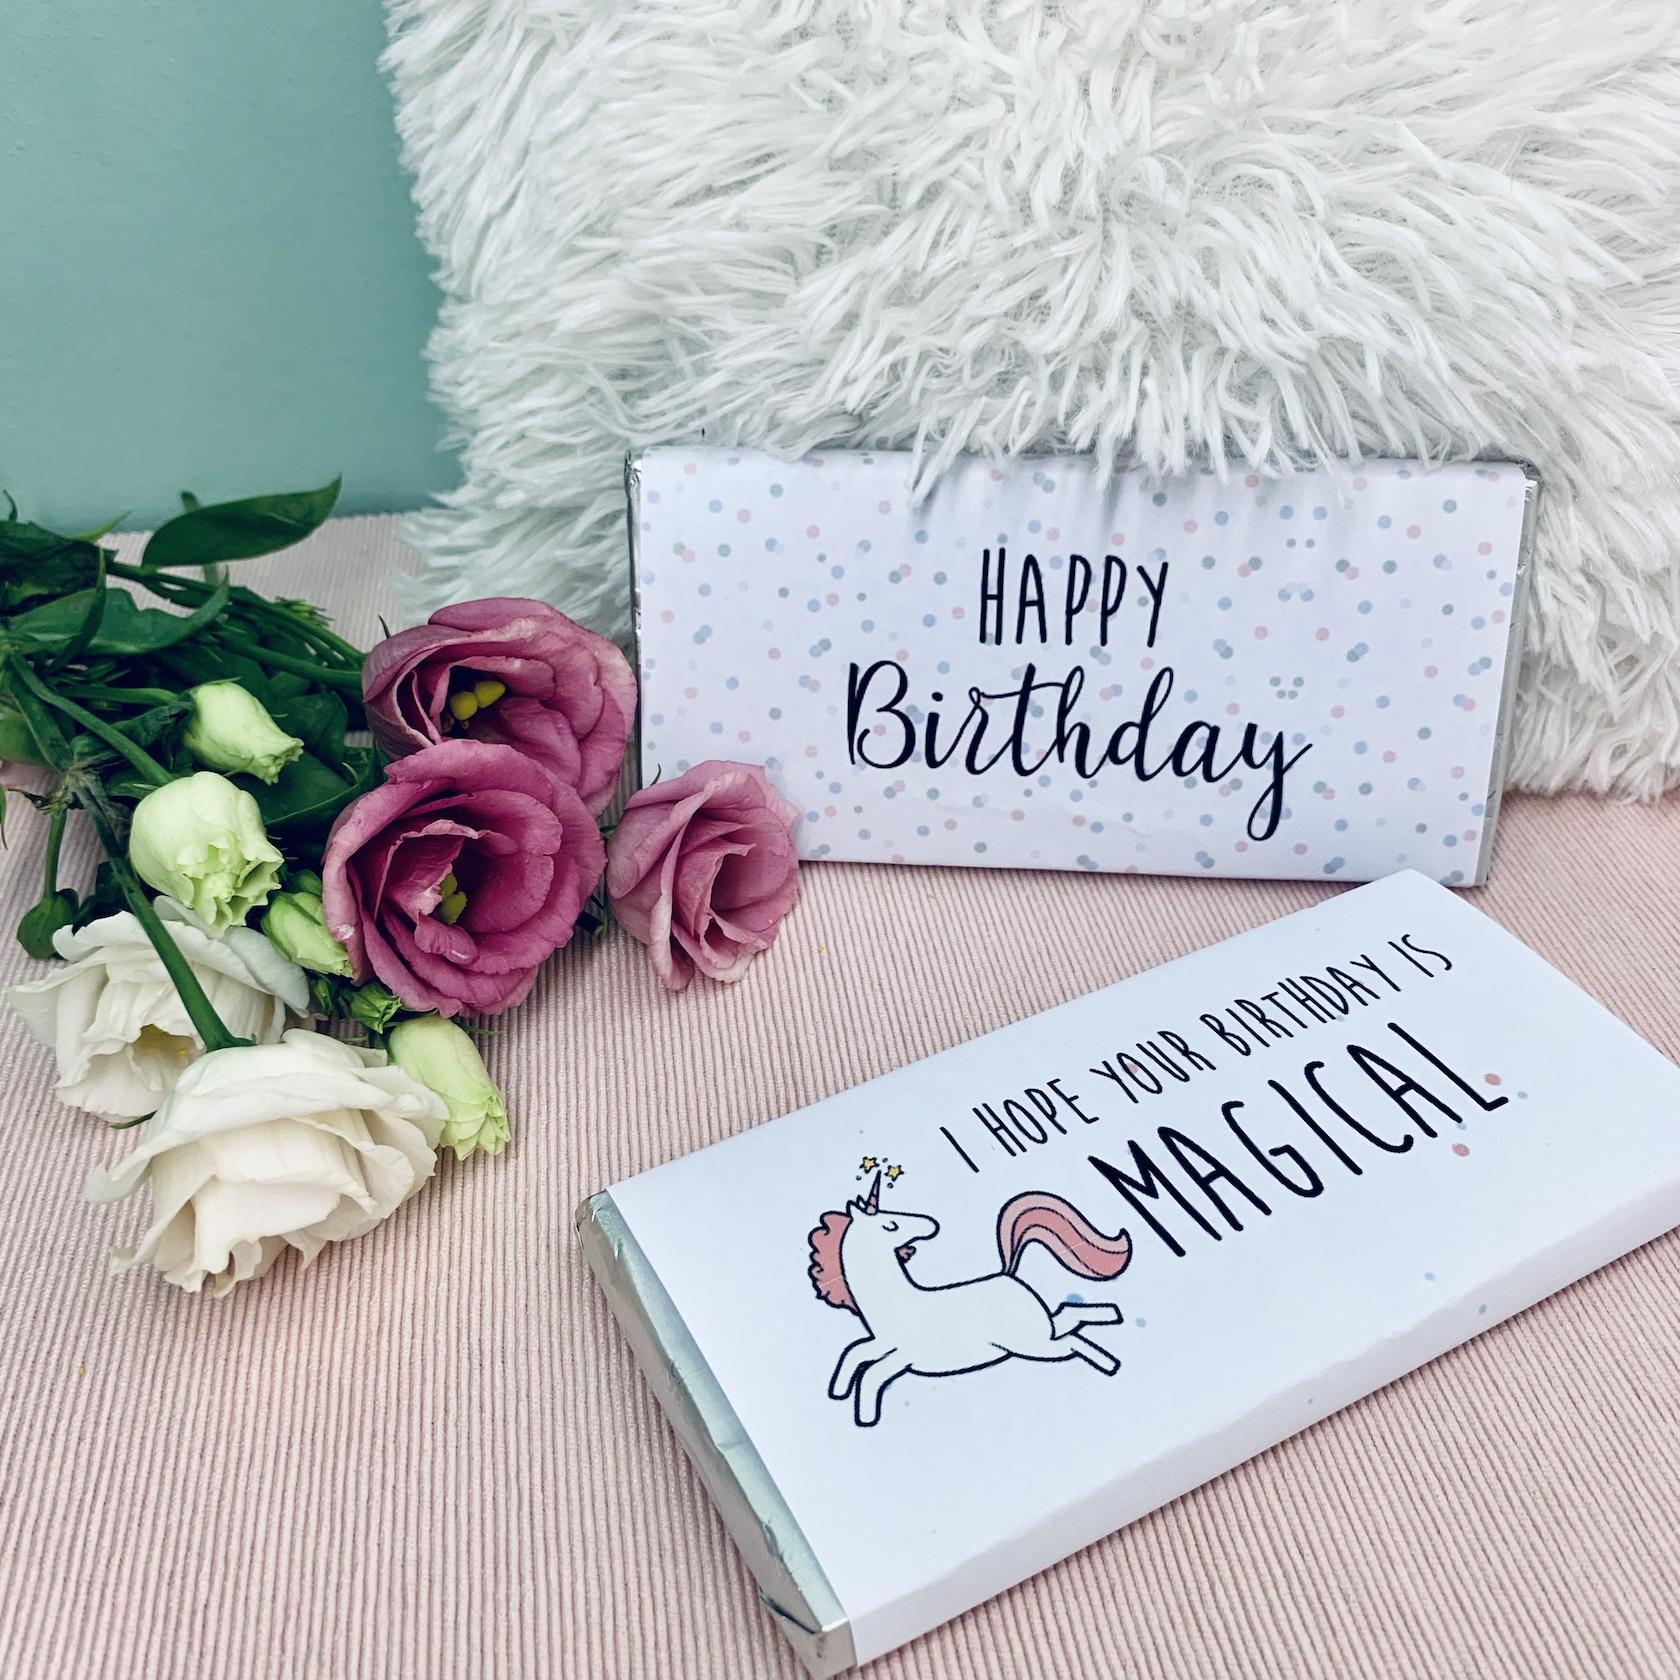 Geburtstag Schokoladentafeln